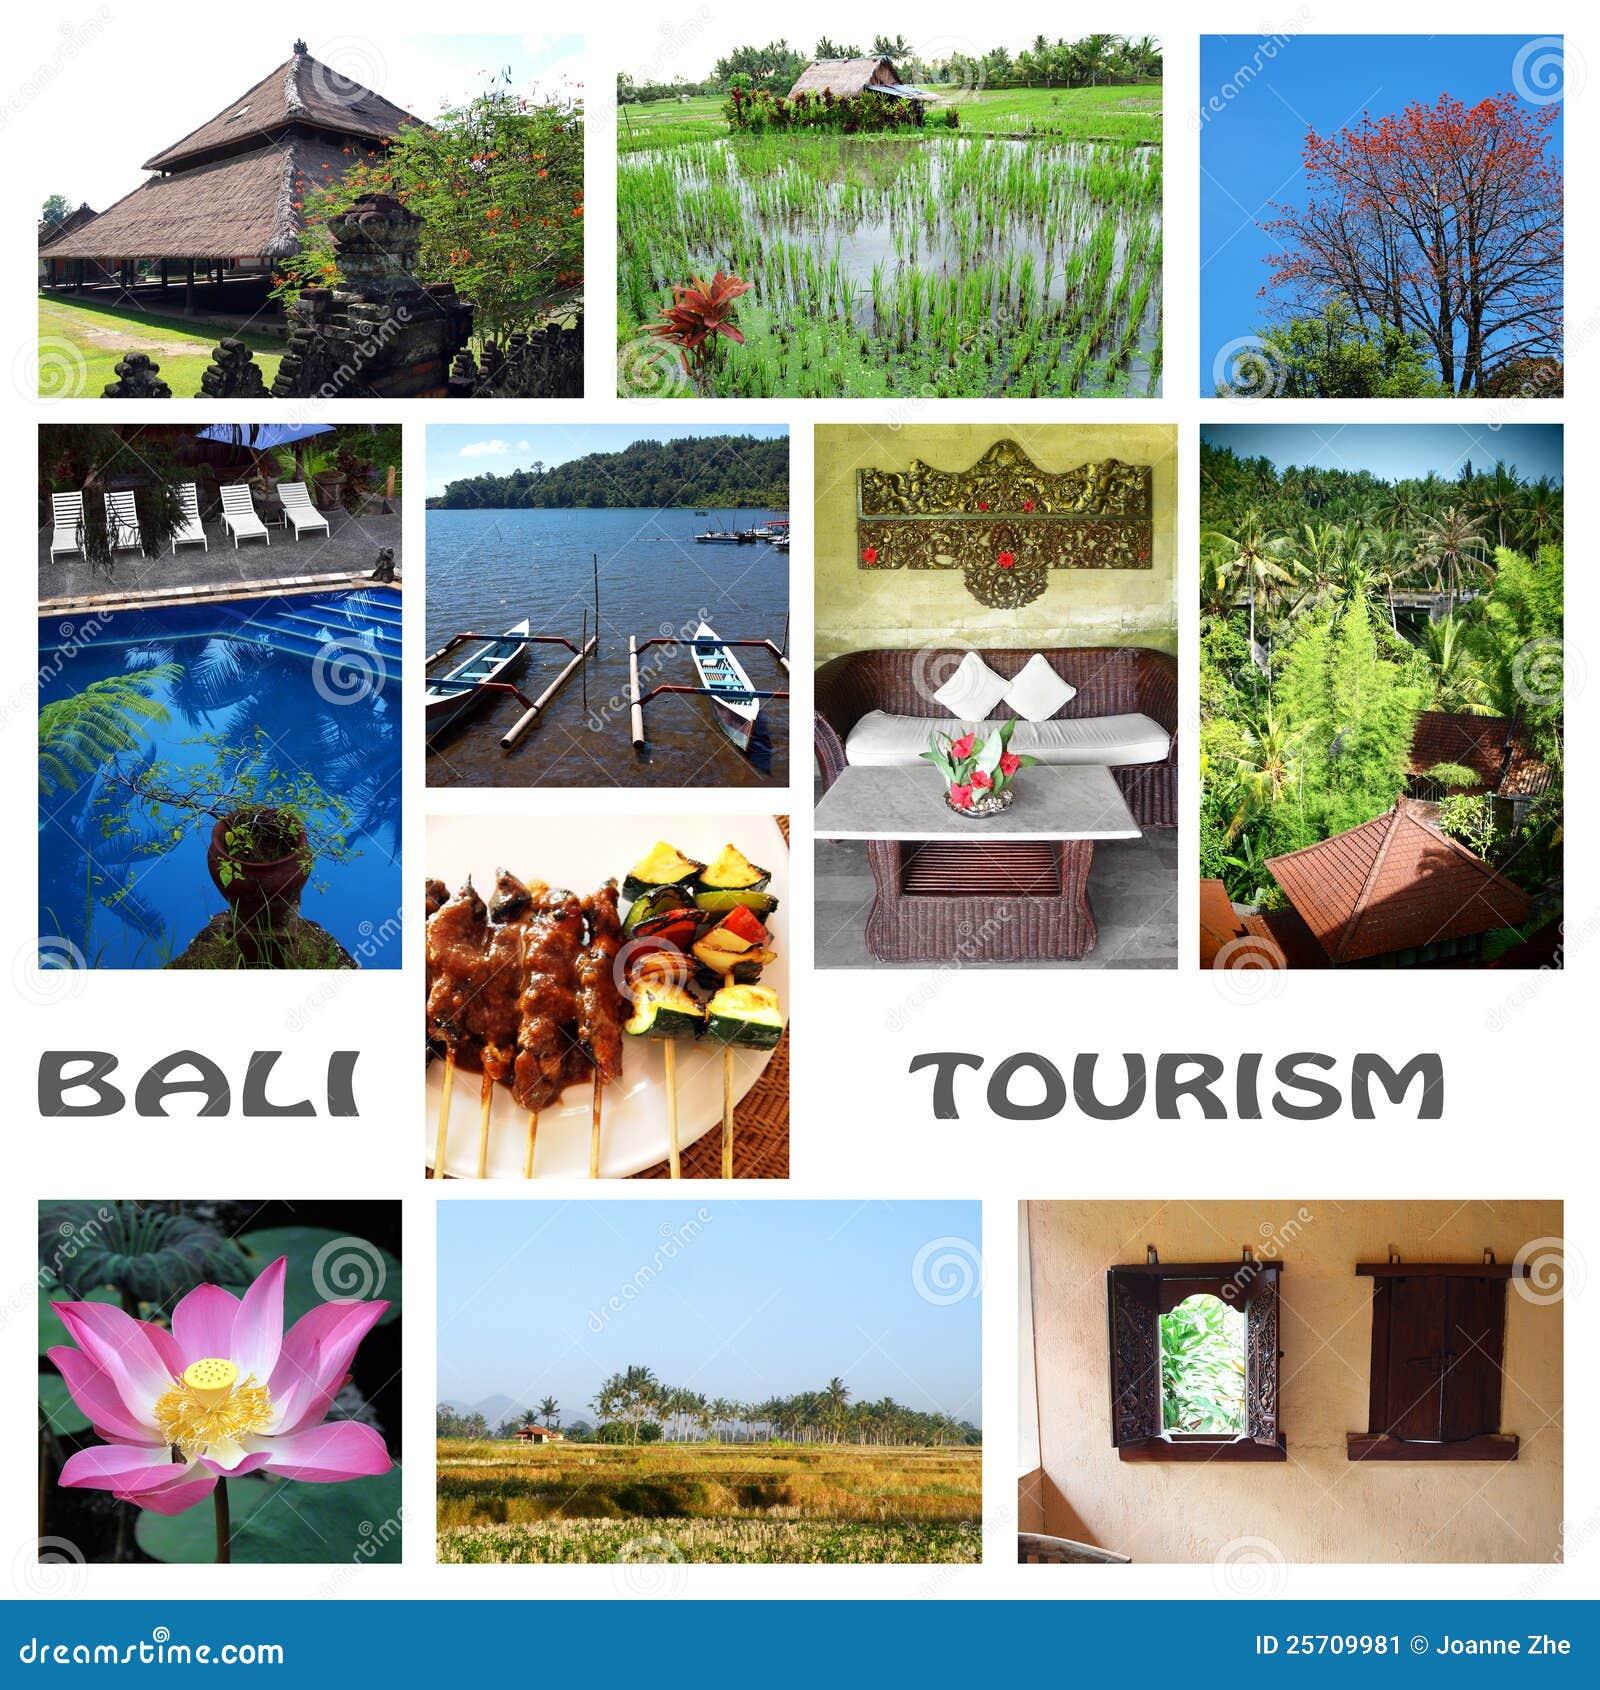 Bali tourism collage